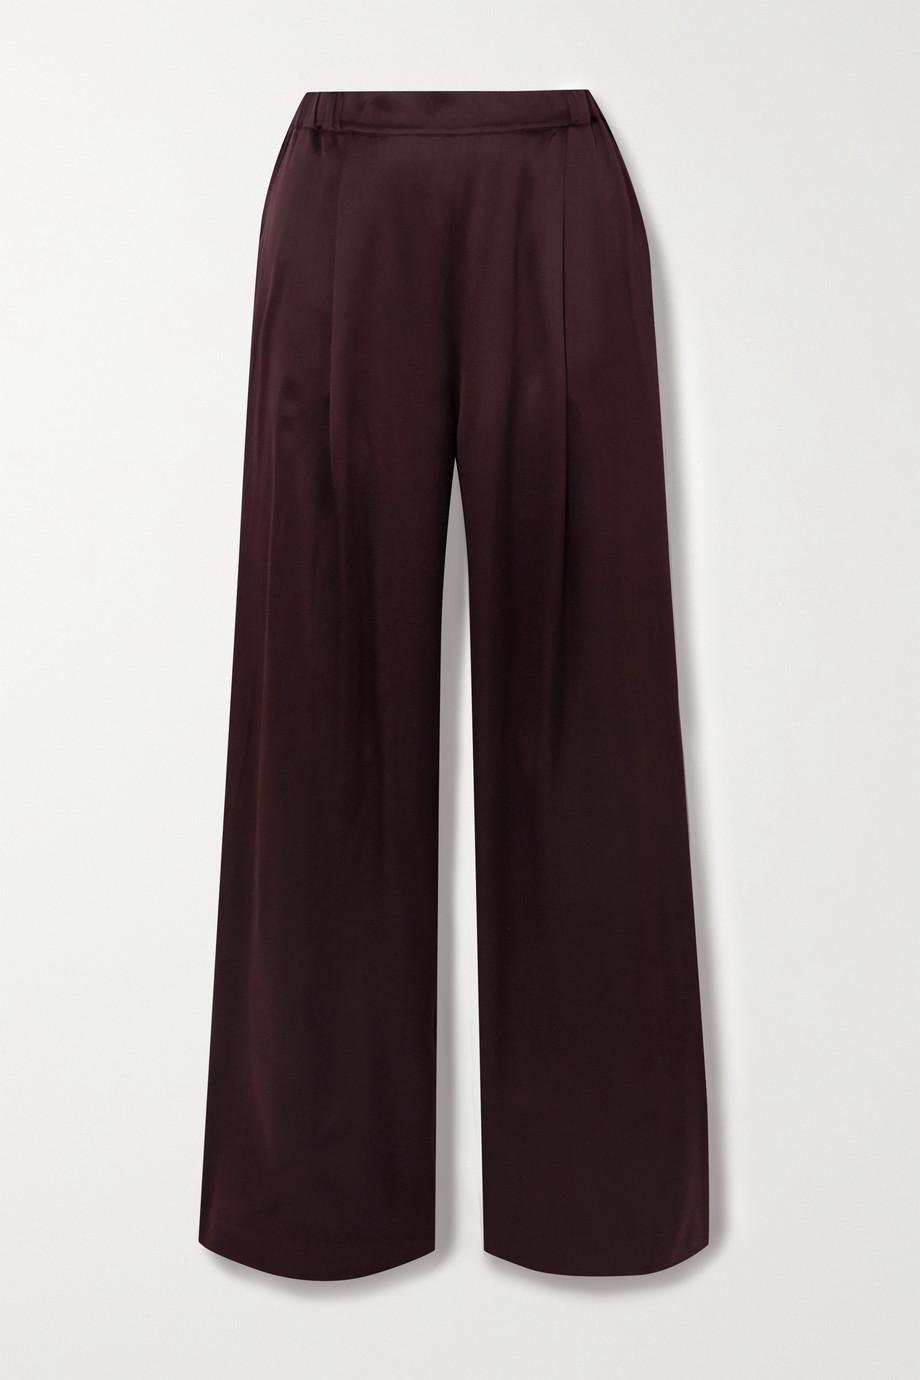 Carine Gilson Silk-satin pajama pants